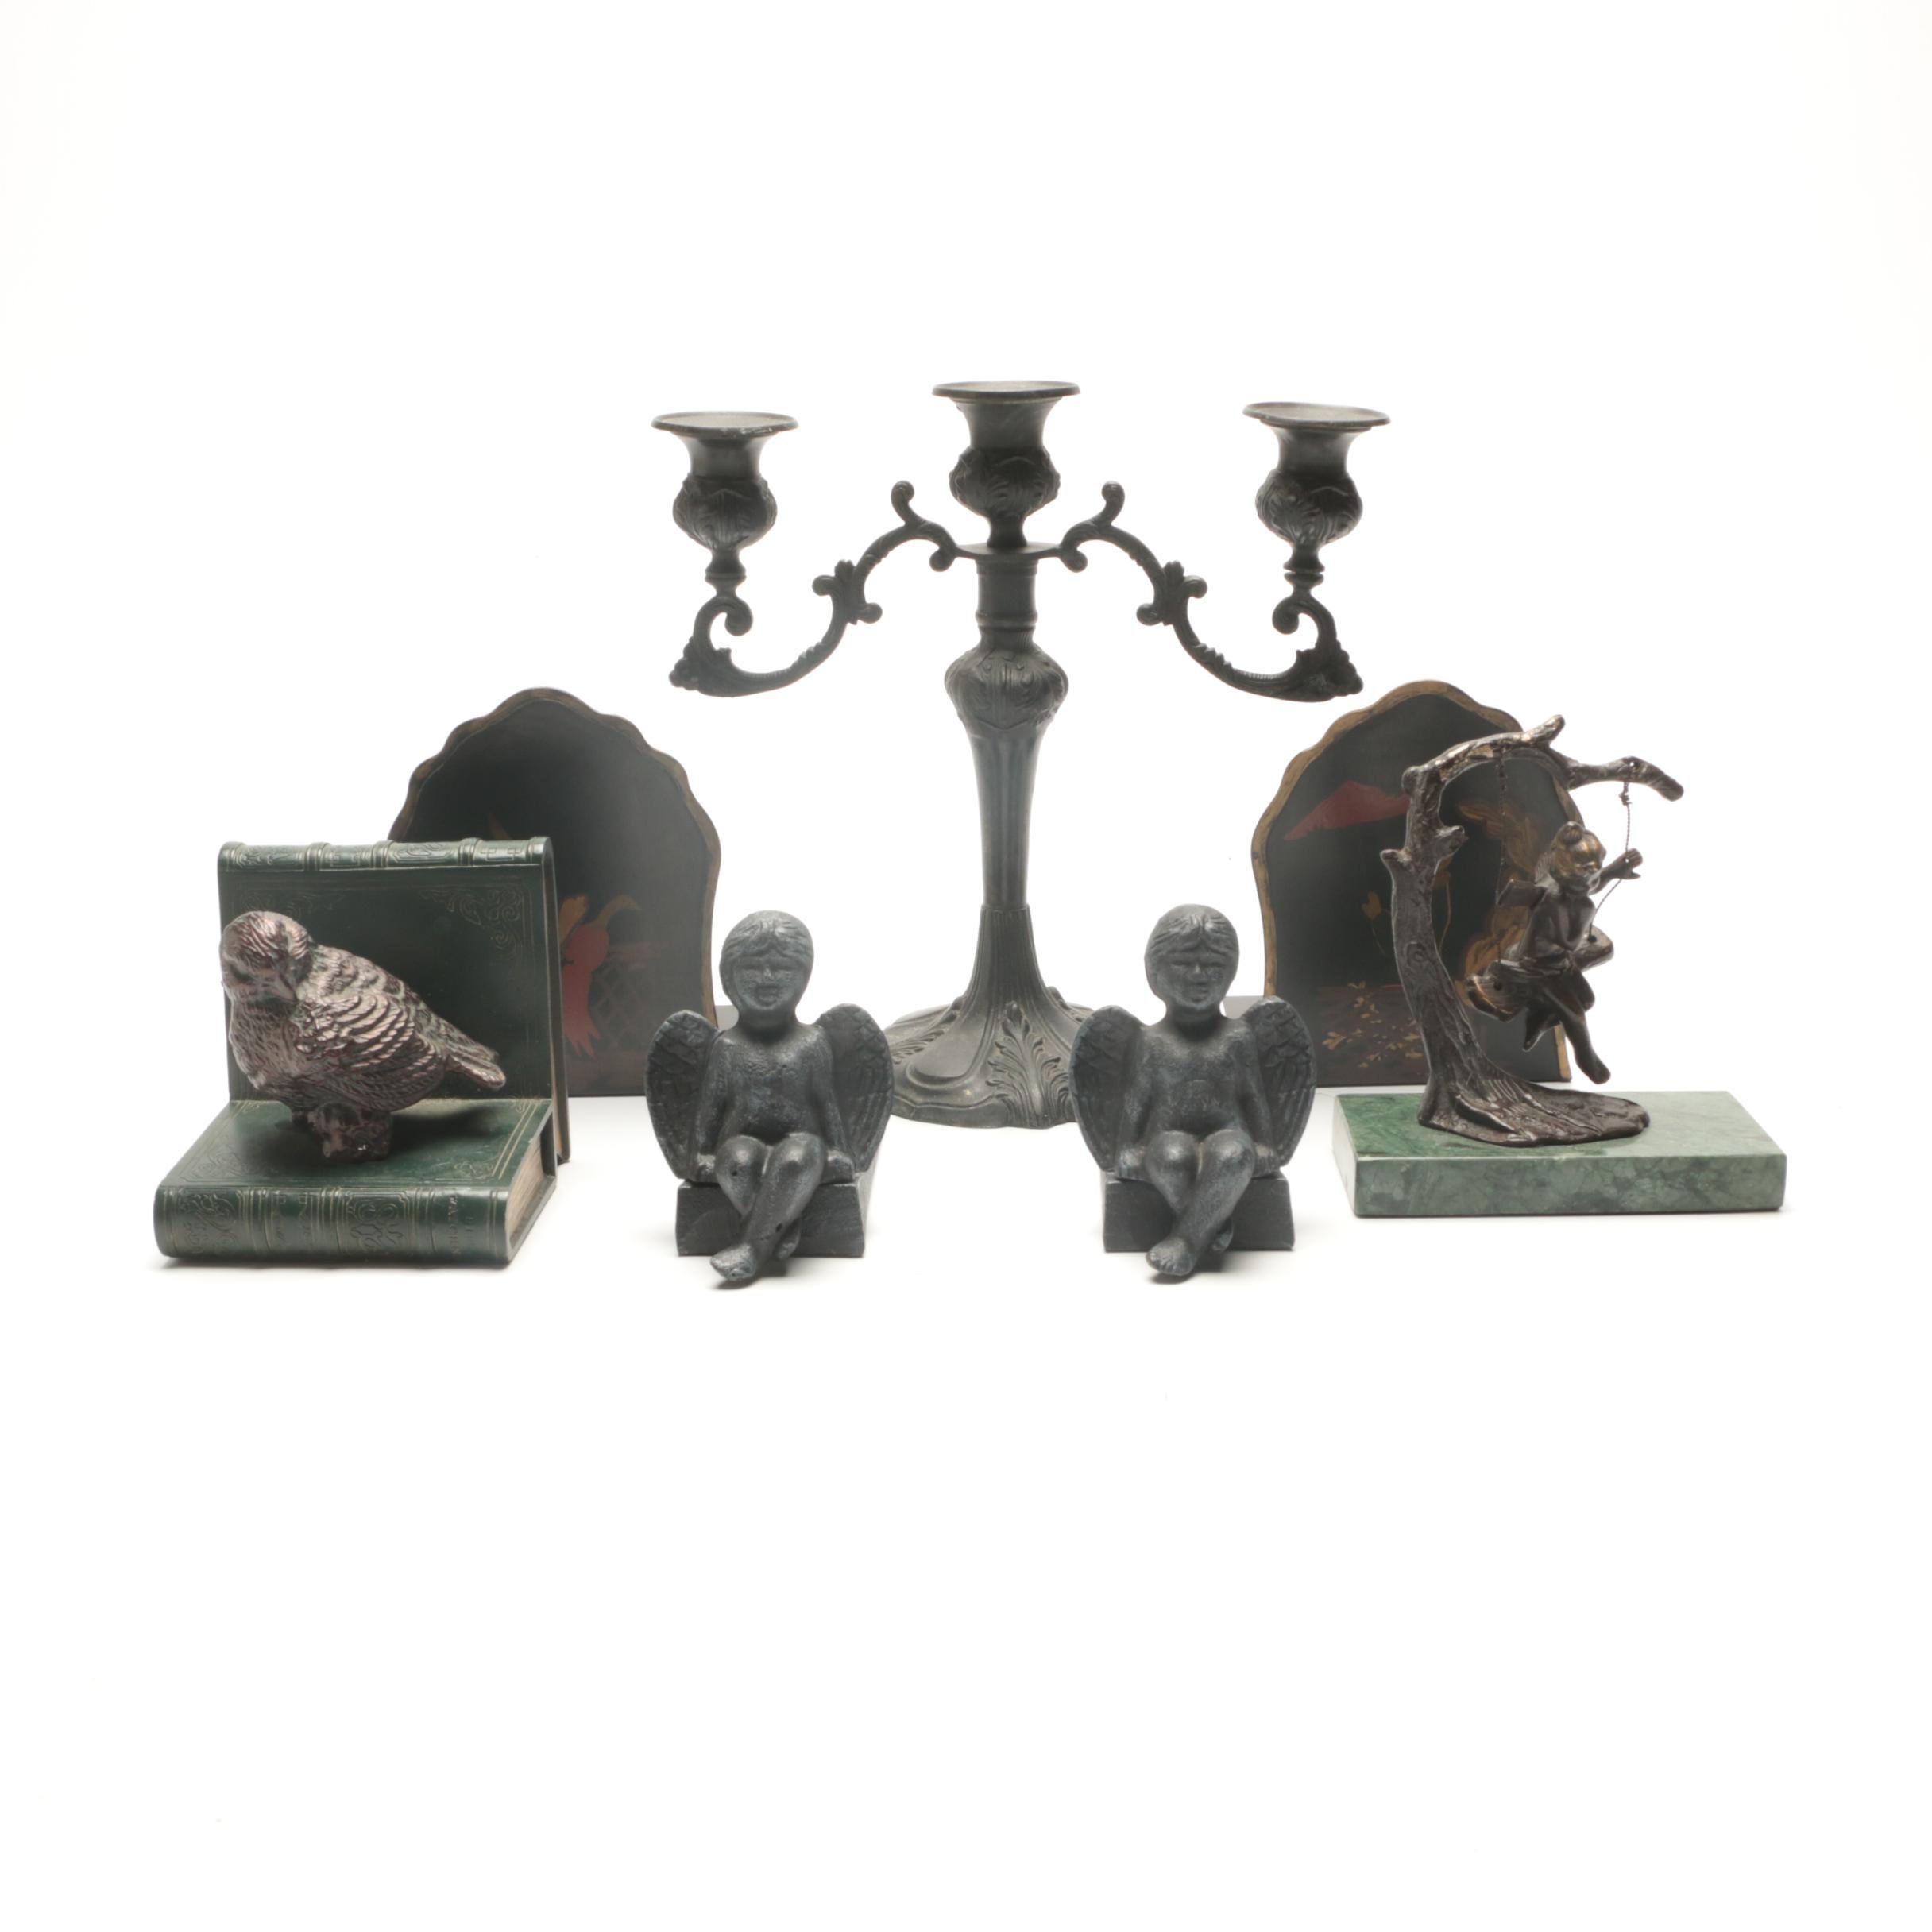 Decorative Metalware Including Bookends and Doorstops